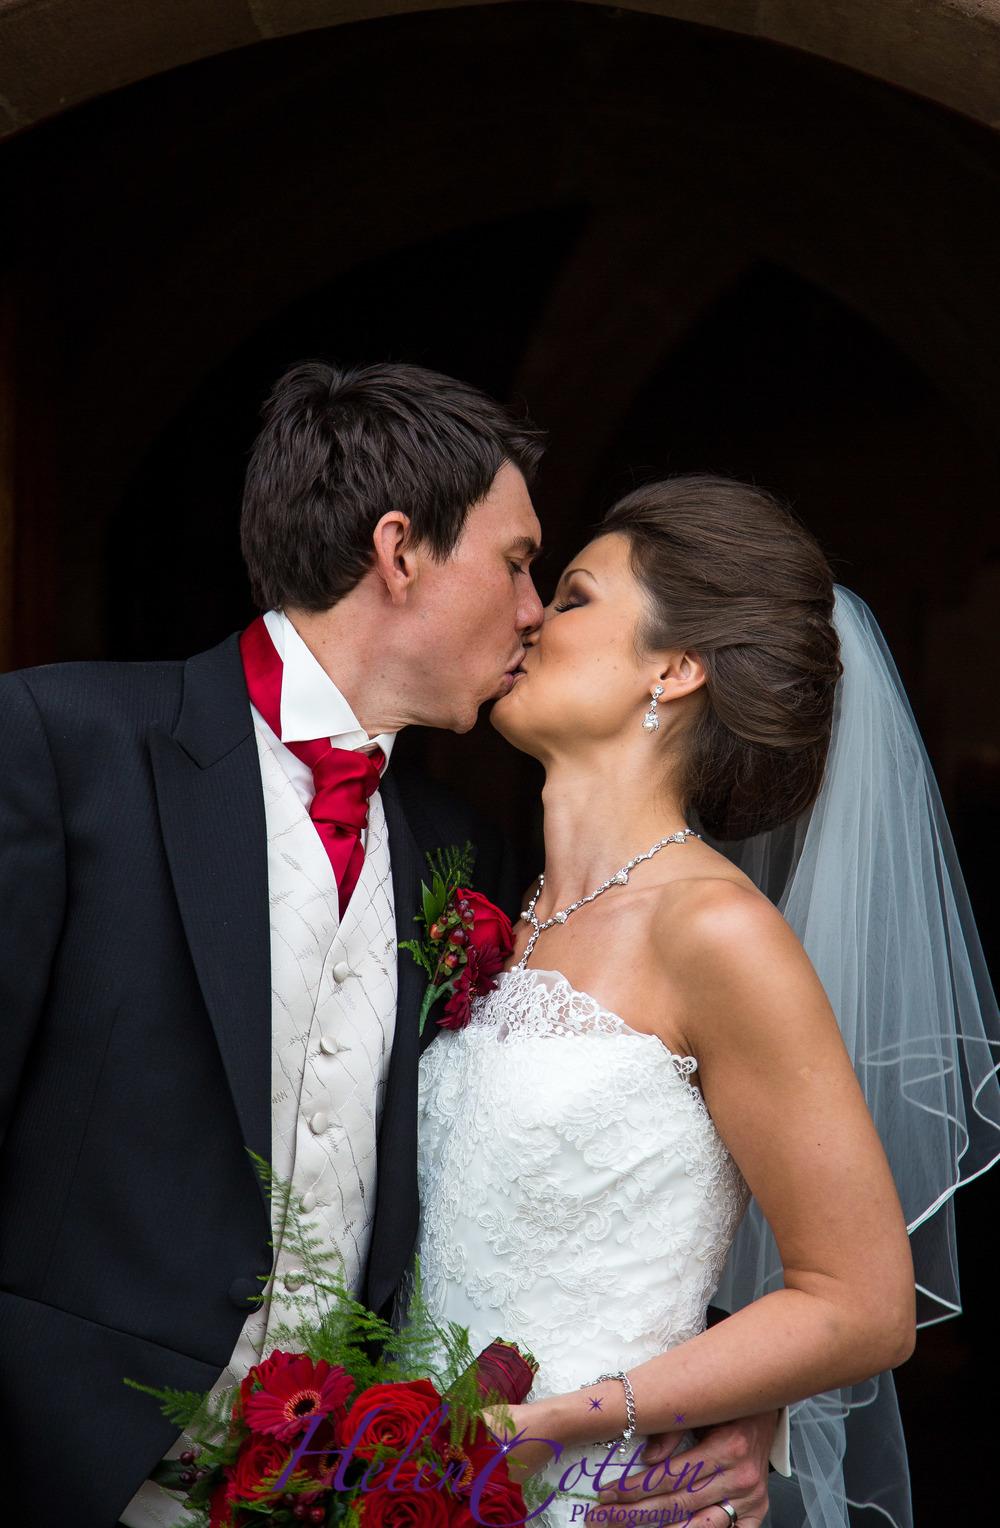 Sian & Rob's Wedding_Helen Cotton Photography©-0825.JPG